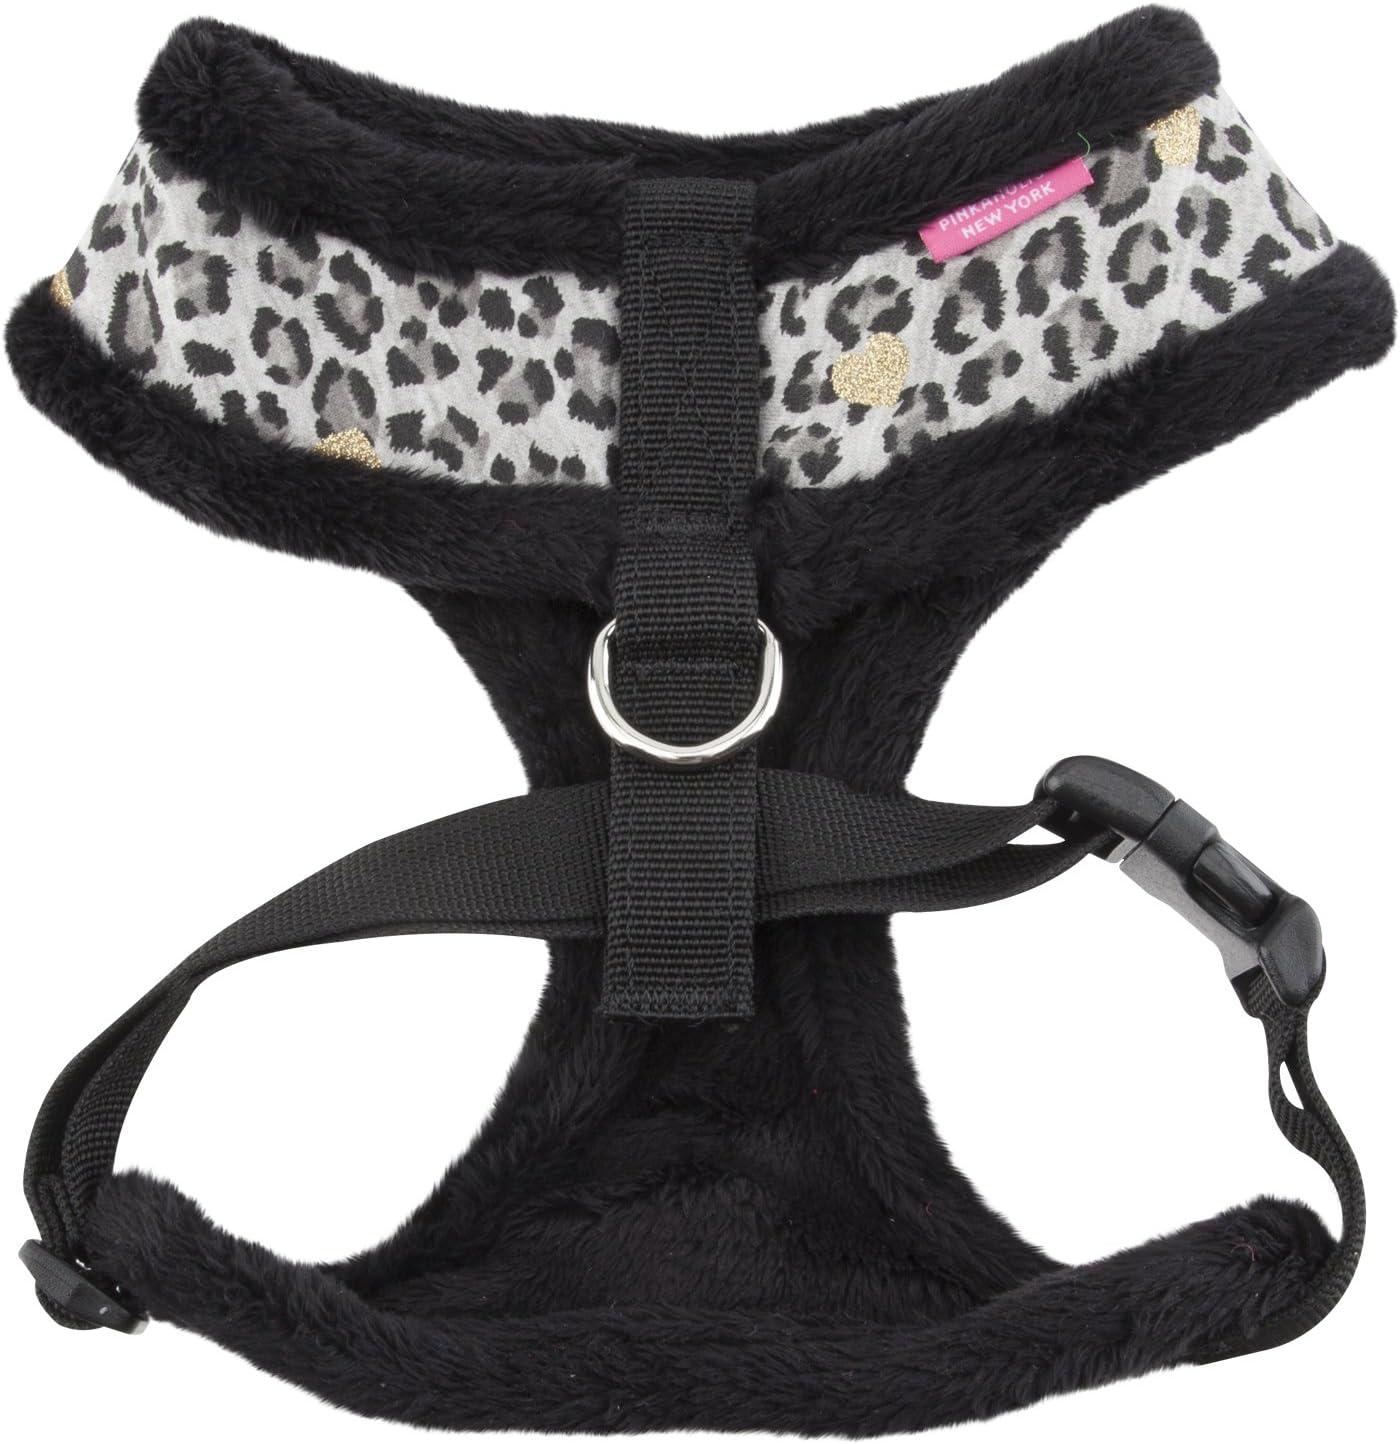 Medium Black Pinkaholic New York Leo Pug Harness Harness